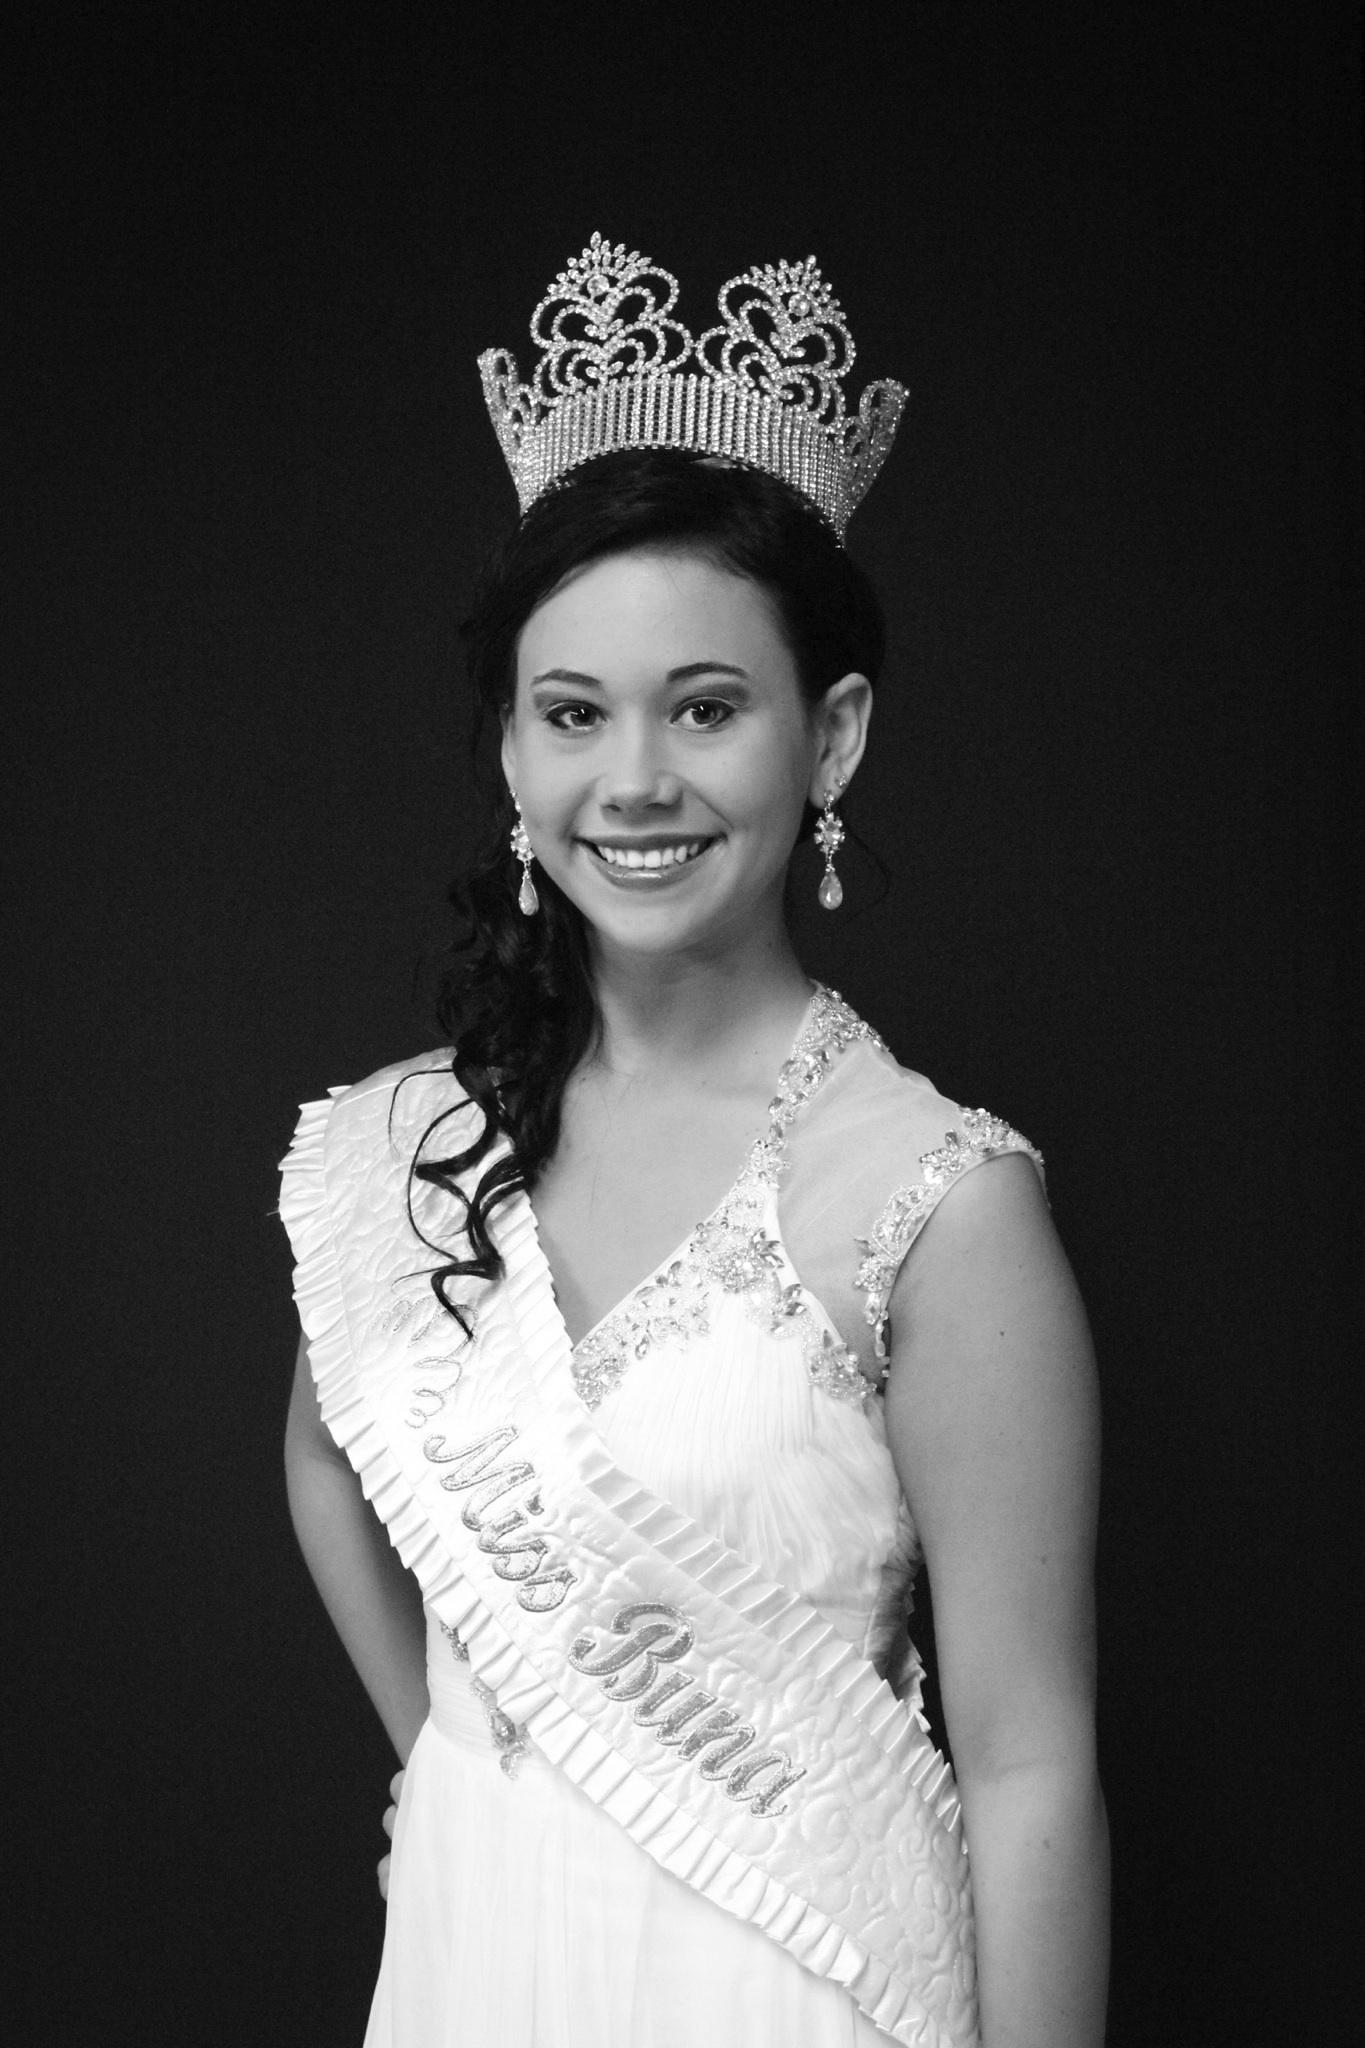 Sara Moore - Miss Buna 2013